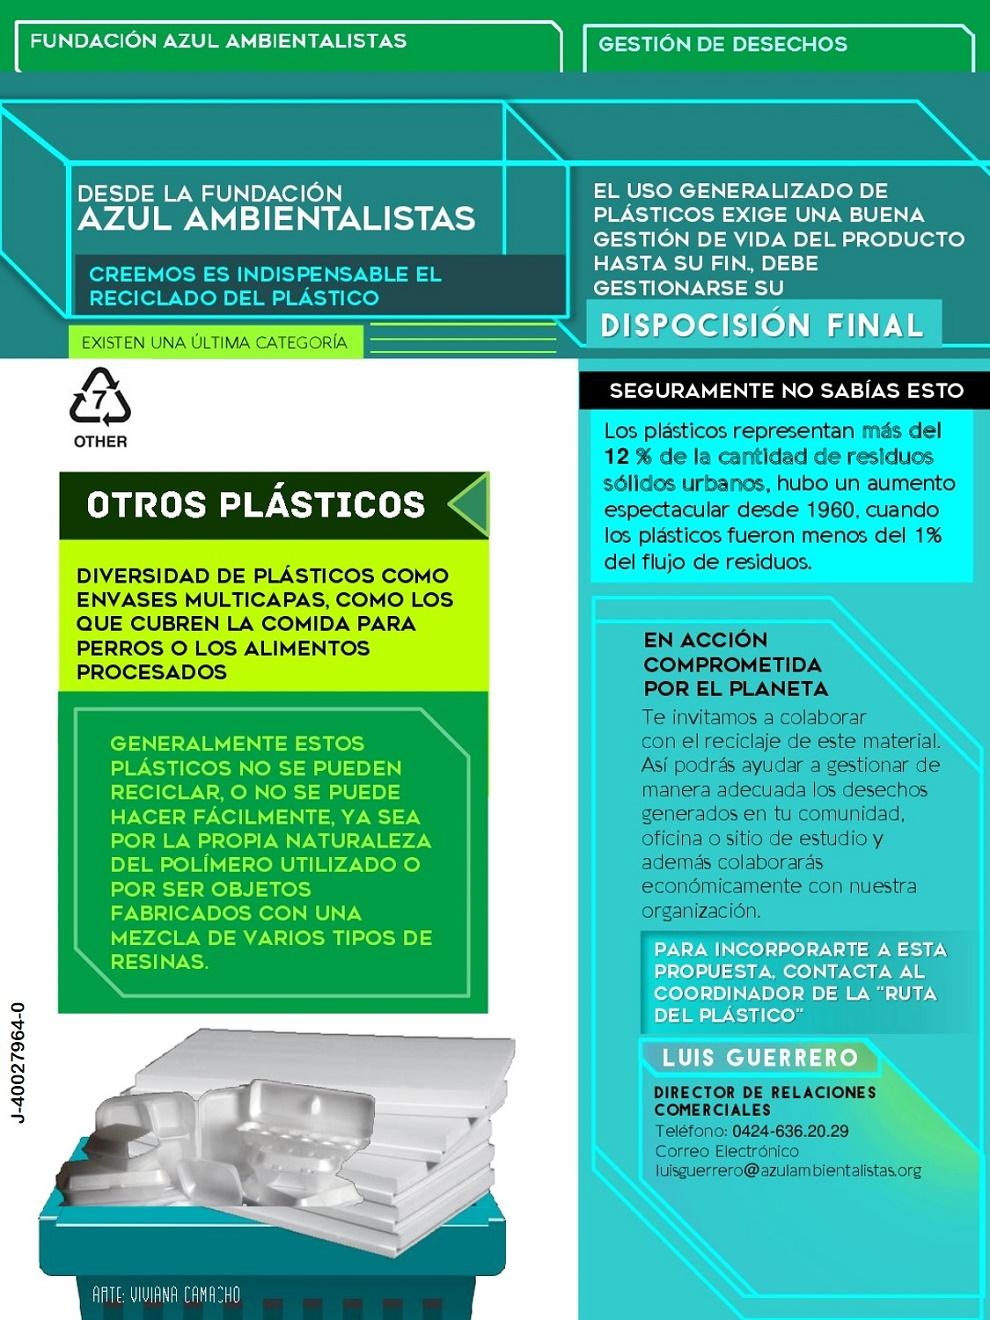 Cartilla-del-Plastico-004